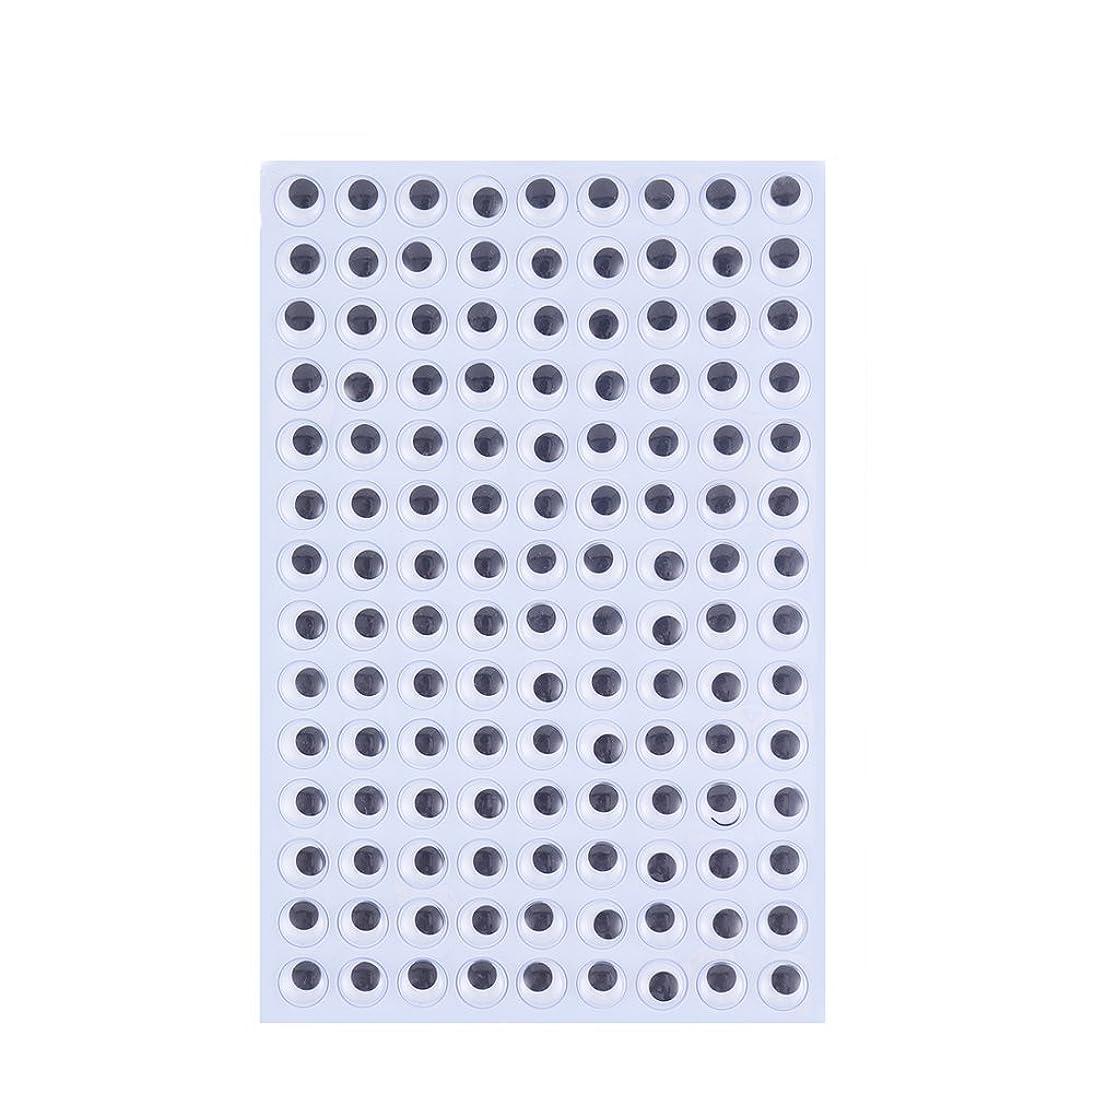 DECORA 12mm Plastic Wiggle Eyes Self-Adhesive Googly Eyes for Scrapbooking DIY Crafts